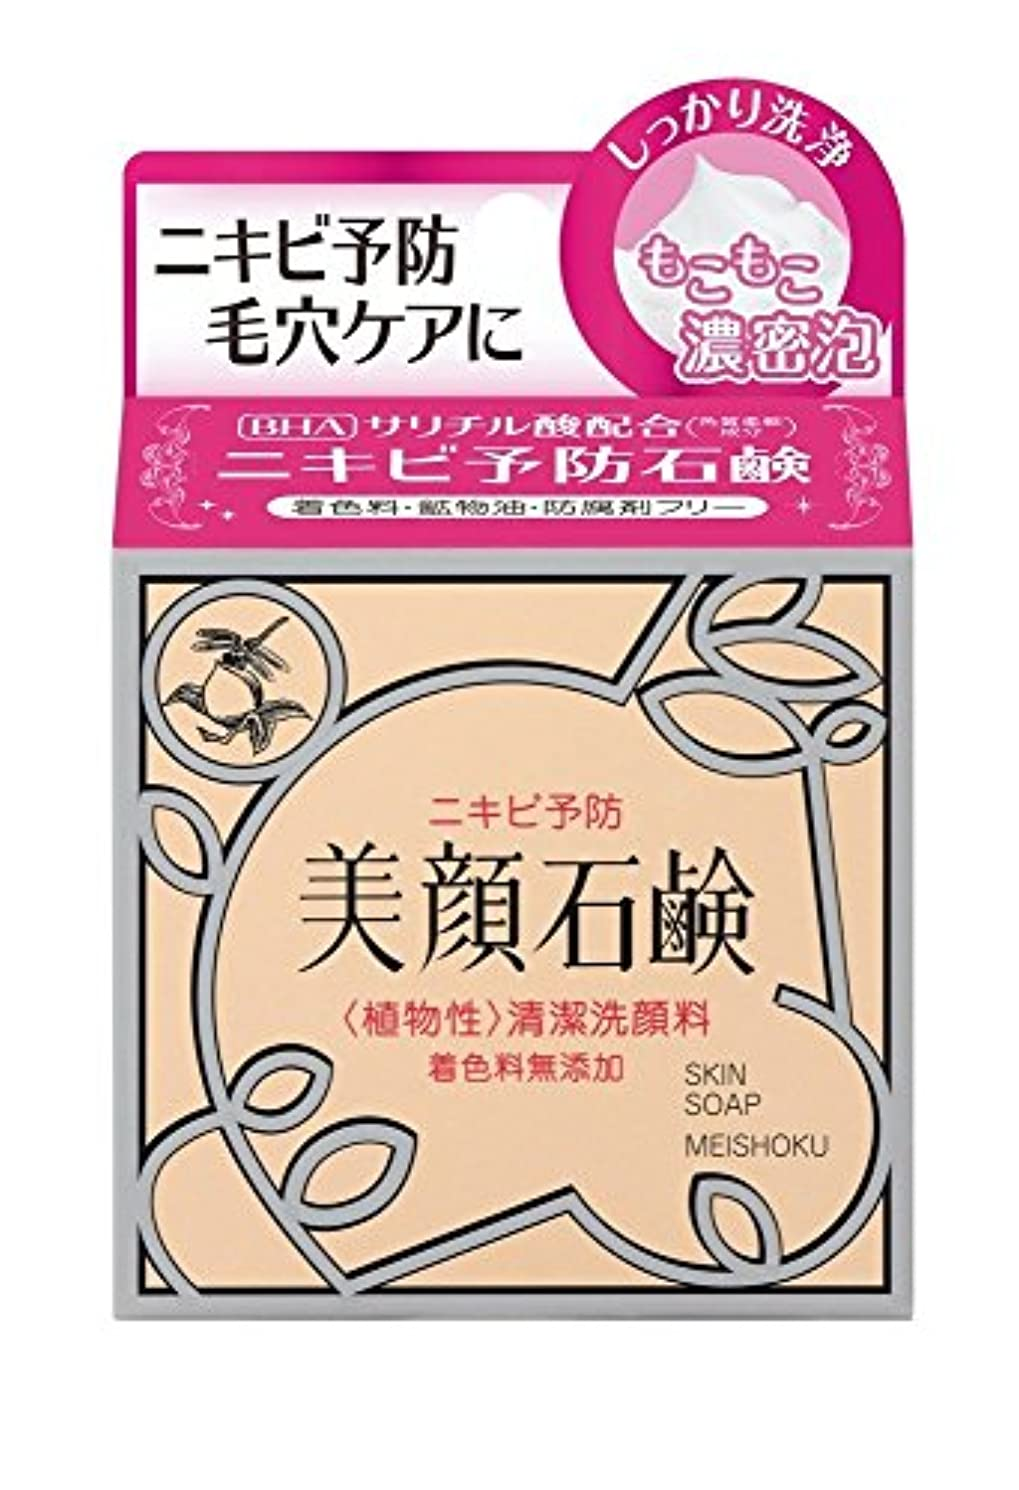 推定する電気ニンニク【医薬部外品】明色化粧品 明色美顔薬用石鹸 80g (日本製)